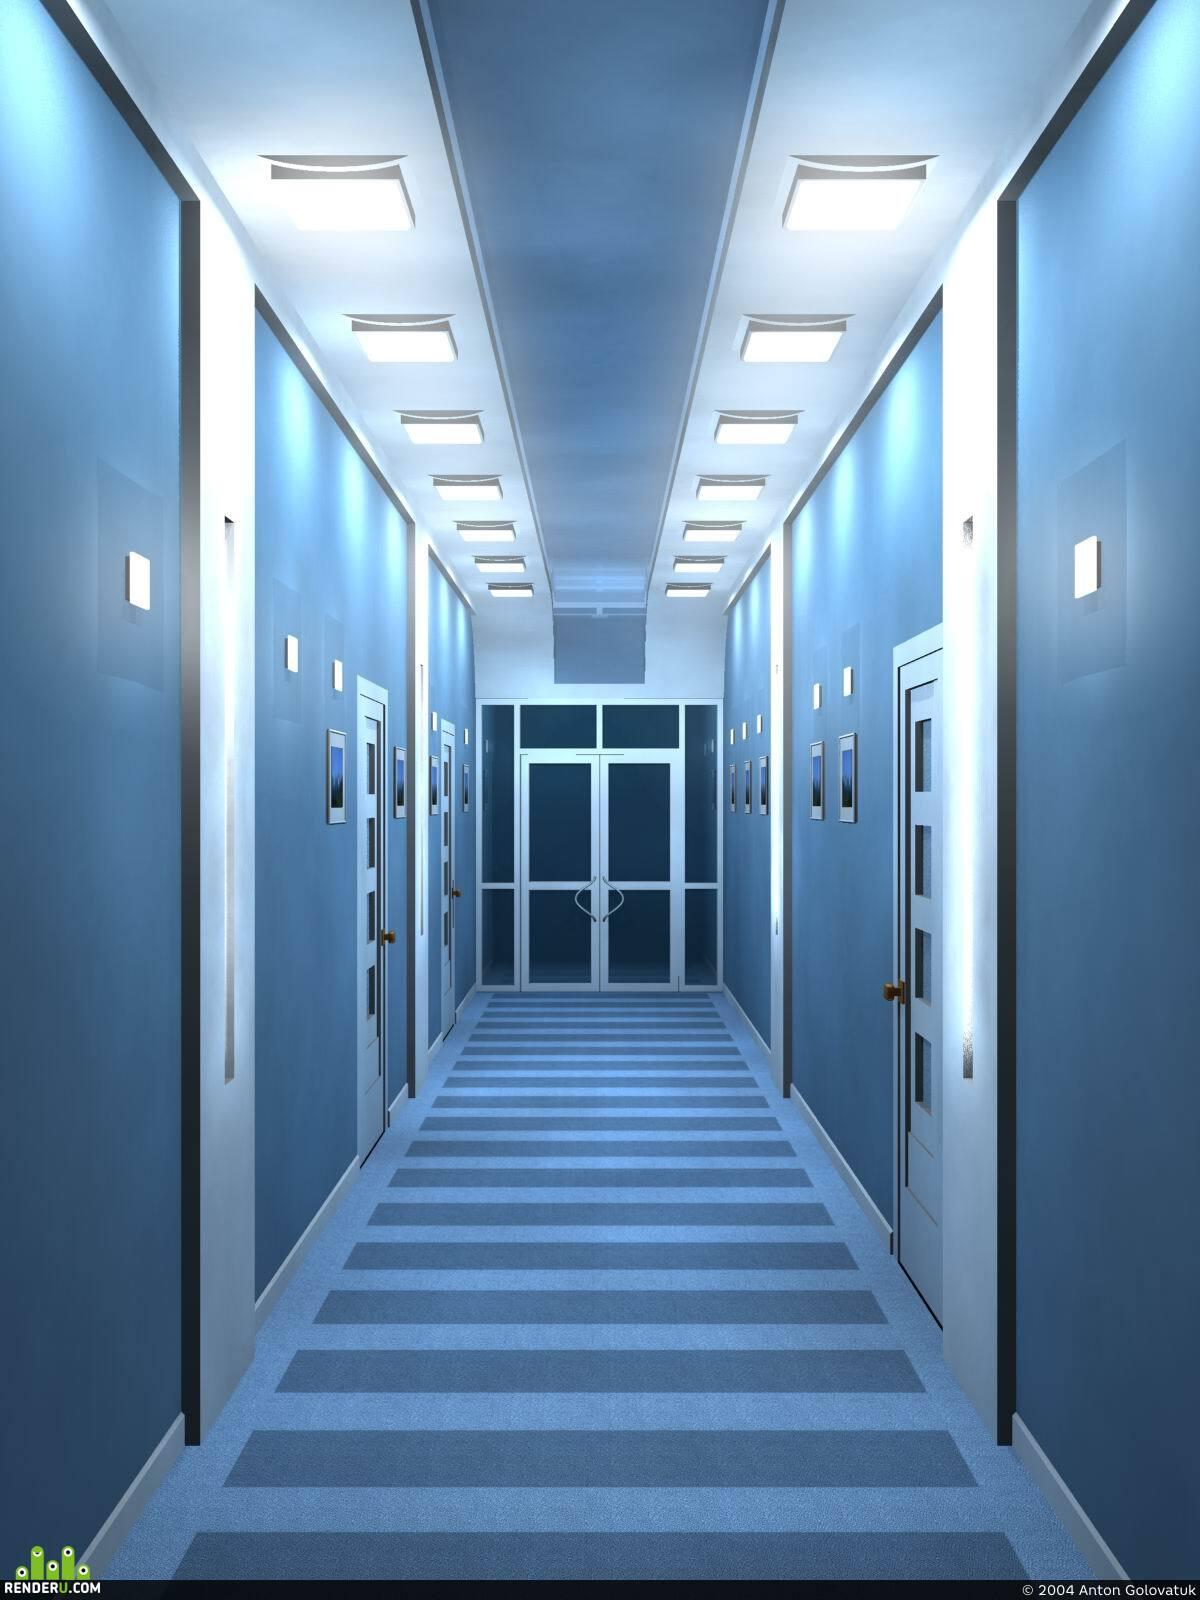 preview коридор(фрагмент)